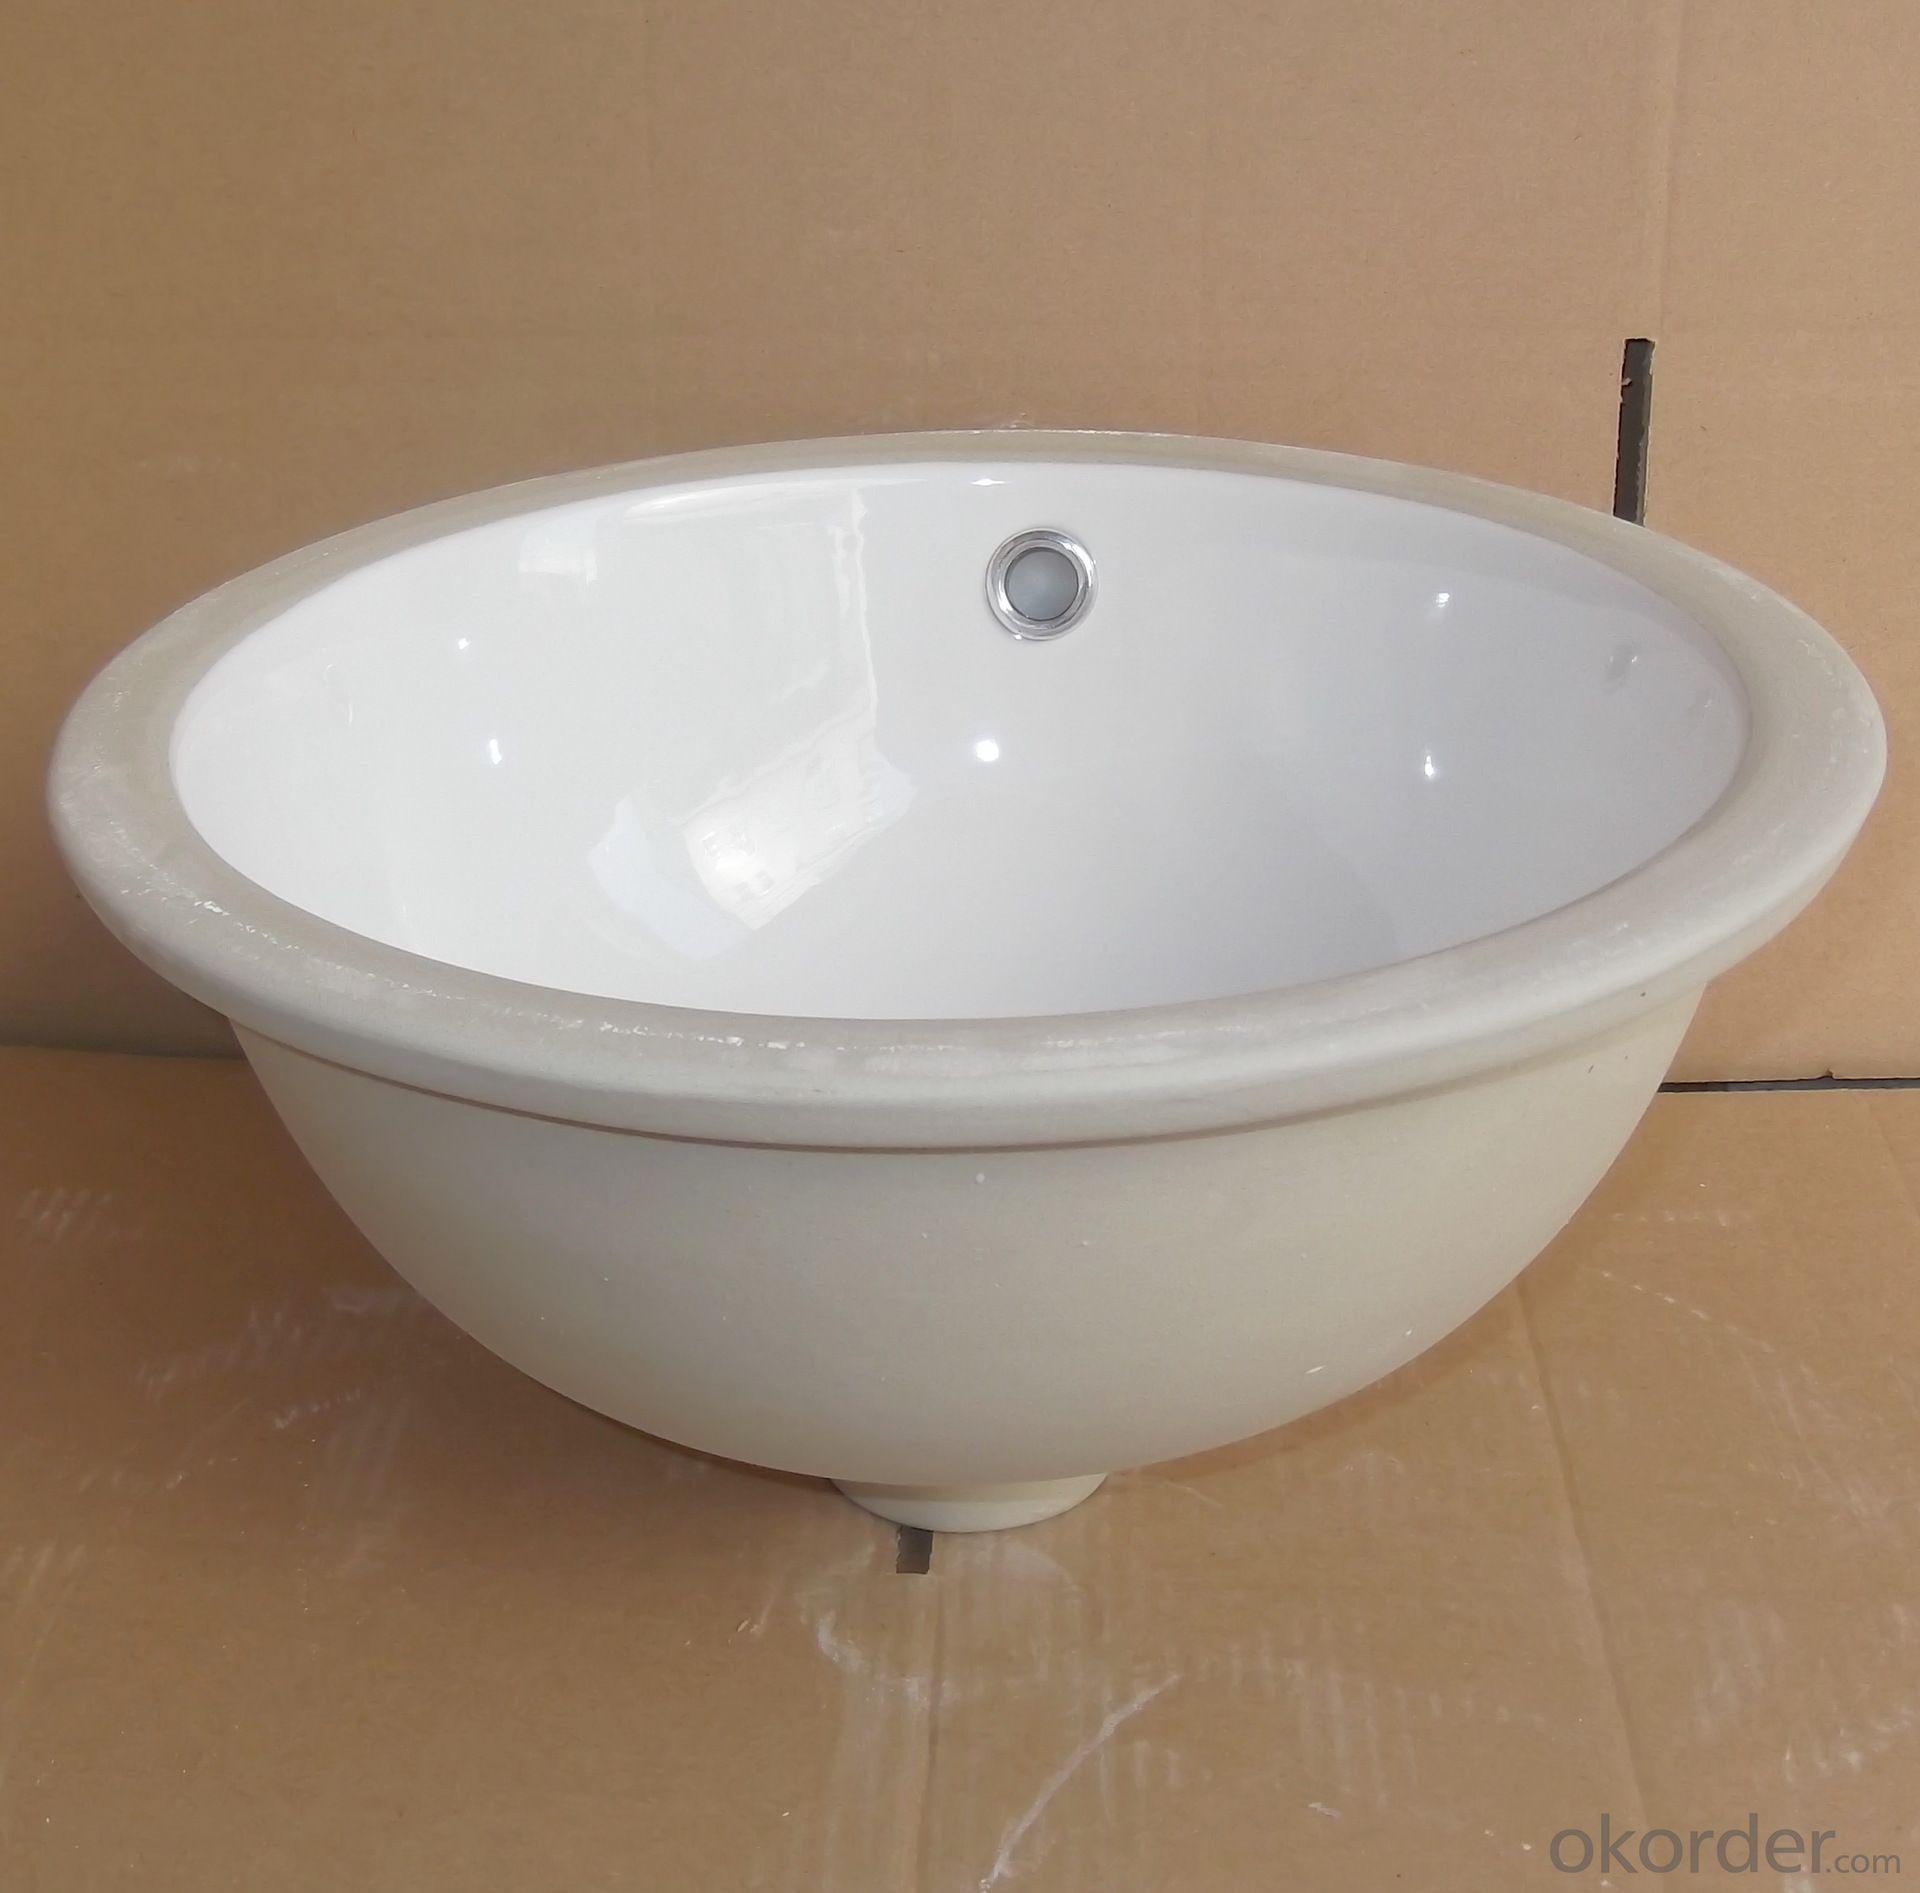 Circular 13-inch white ceramic pots audience